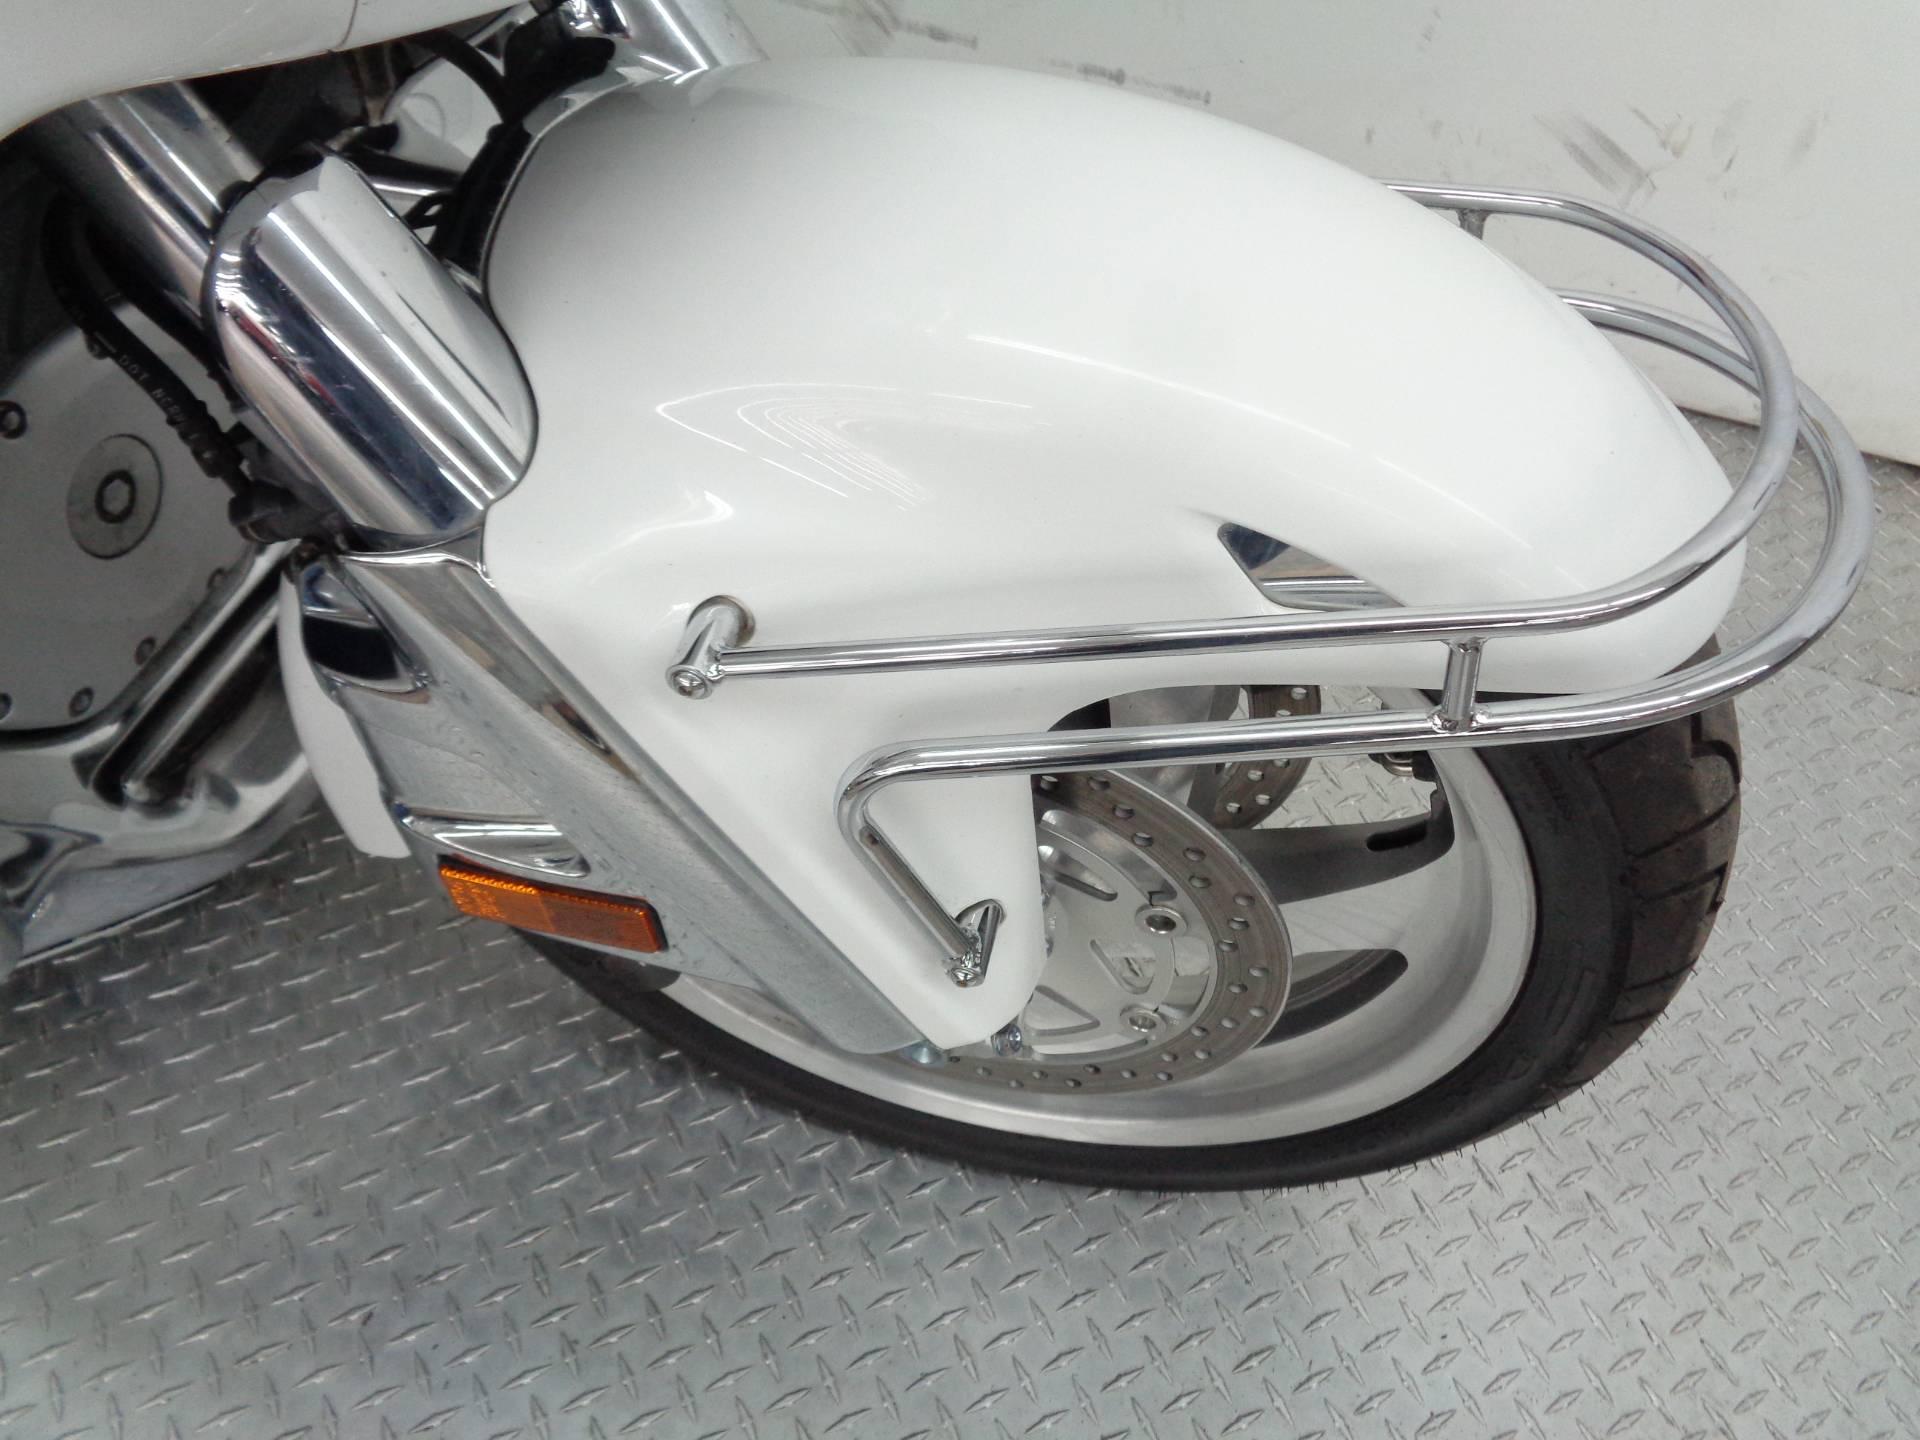 Honda Utvs For Sale Tulsa Ok >> 2005 Honda Goldwing Trike For Sale Tulsa, OK : 81751